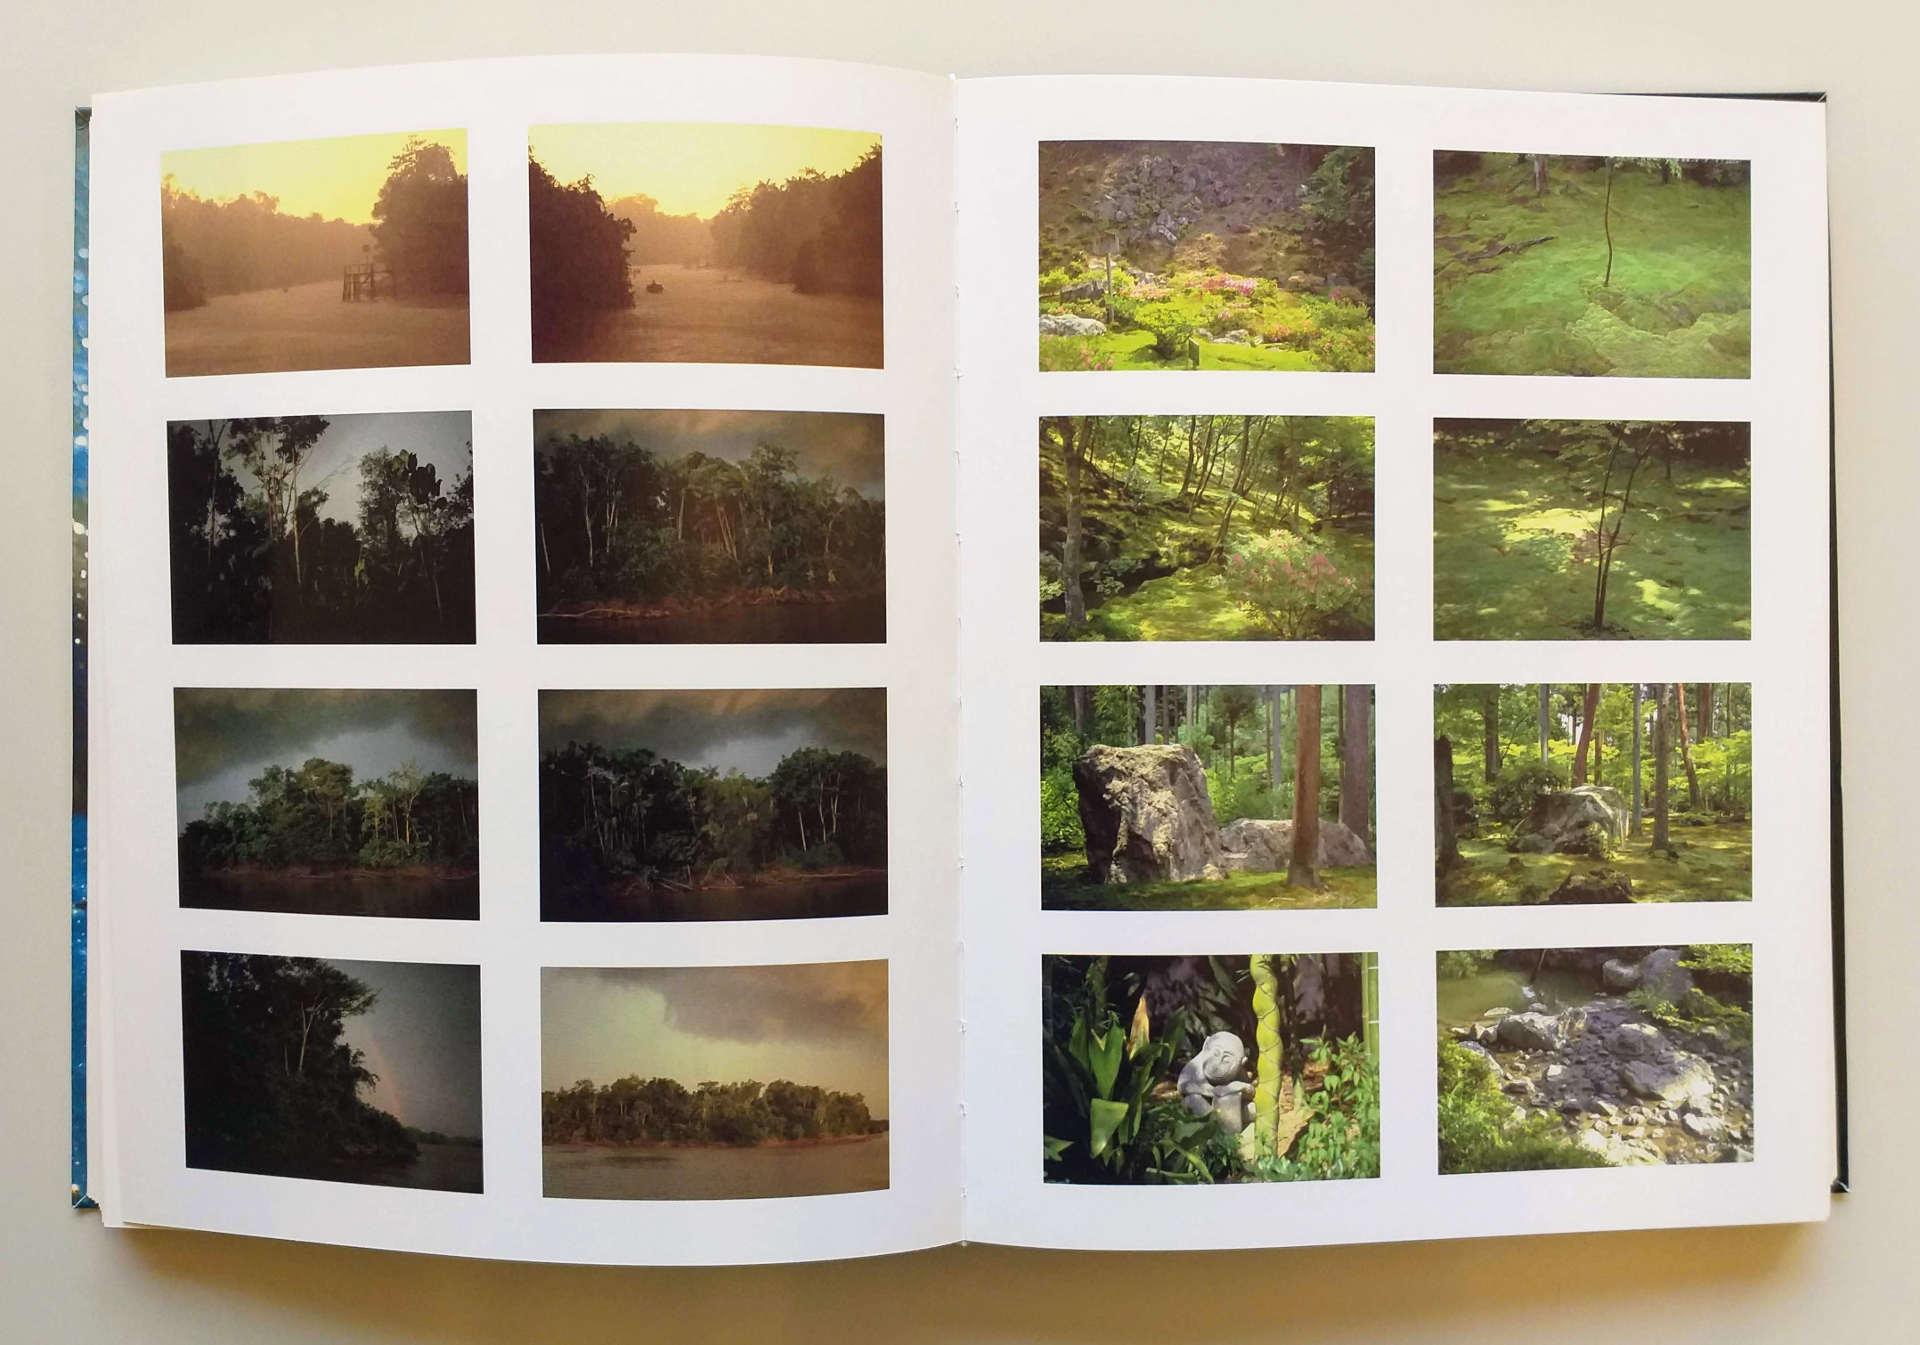 Mundo visível (1997), de Peter Fischli e David Weiss